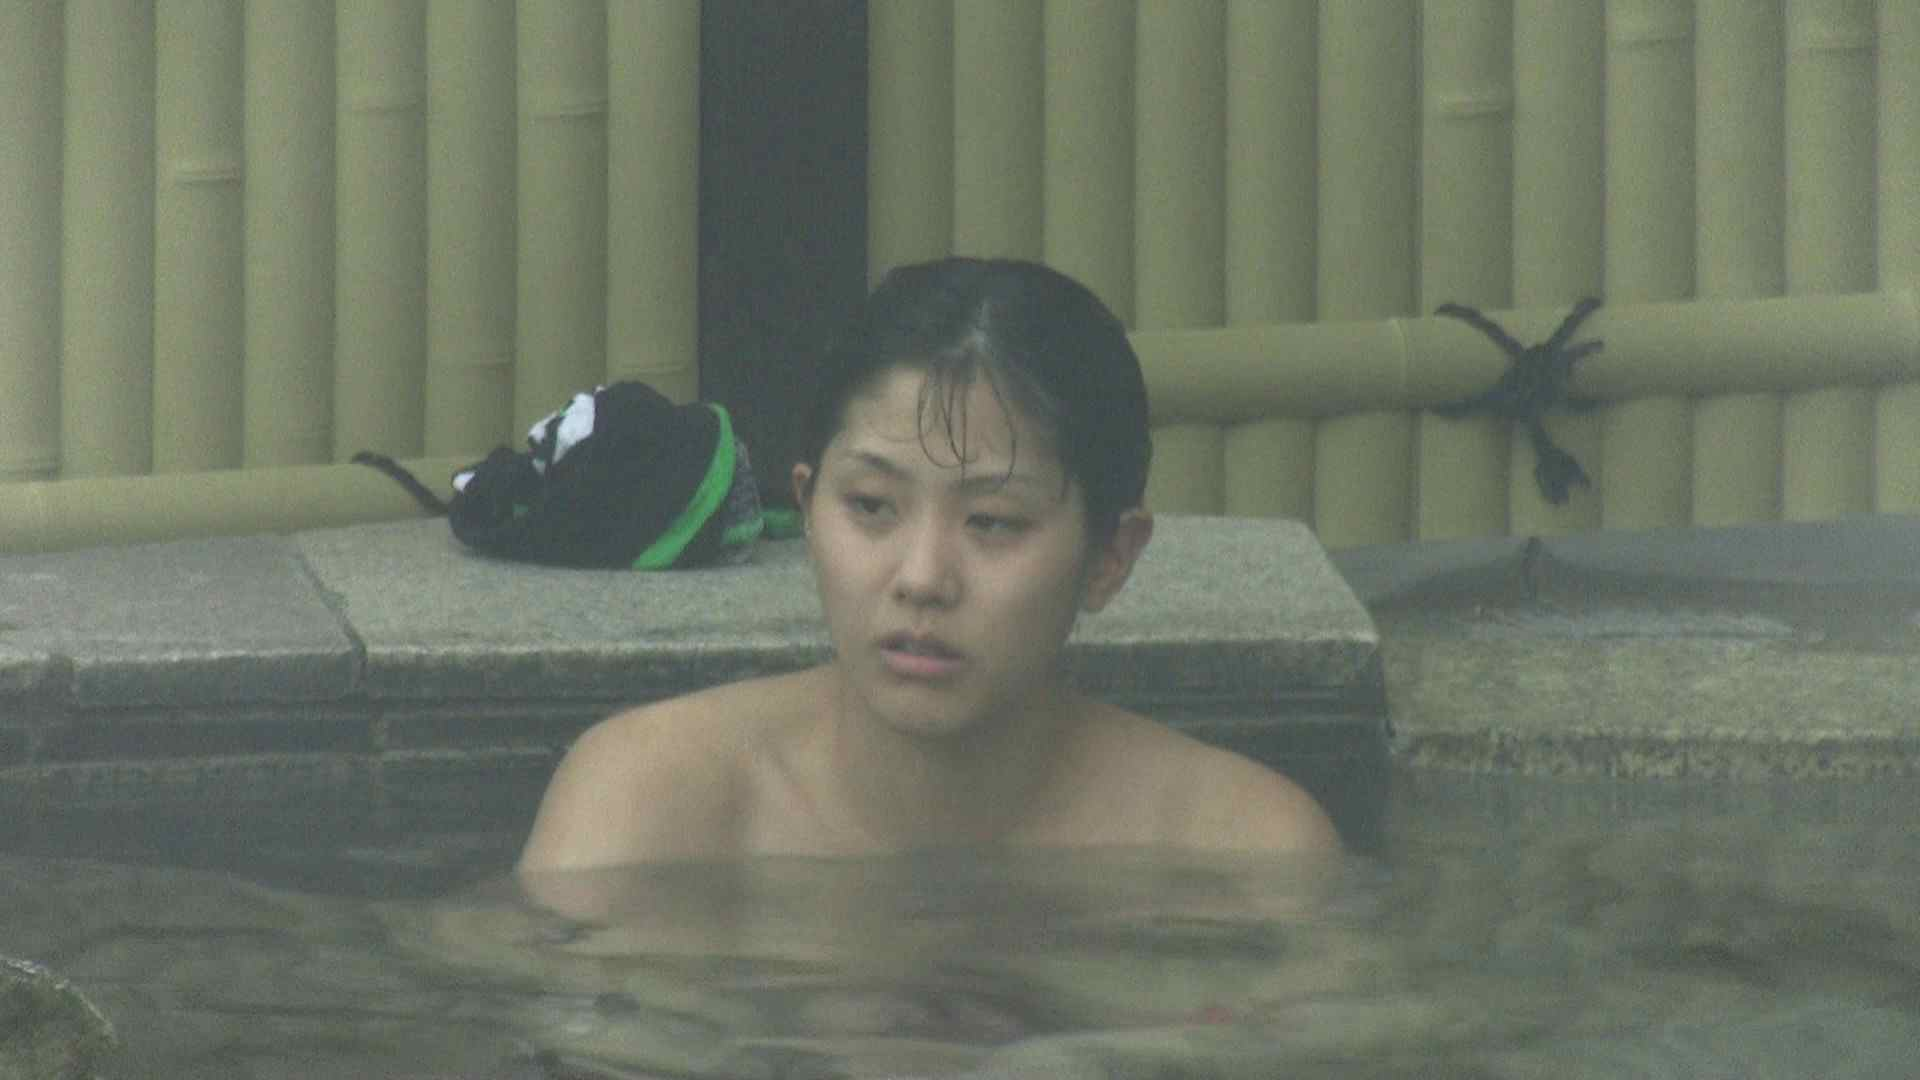 Aquaな露天風呂Vol.174 盗撮  89連発 3